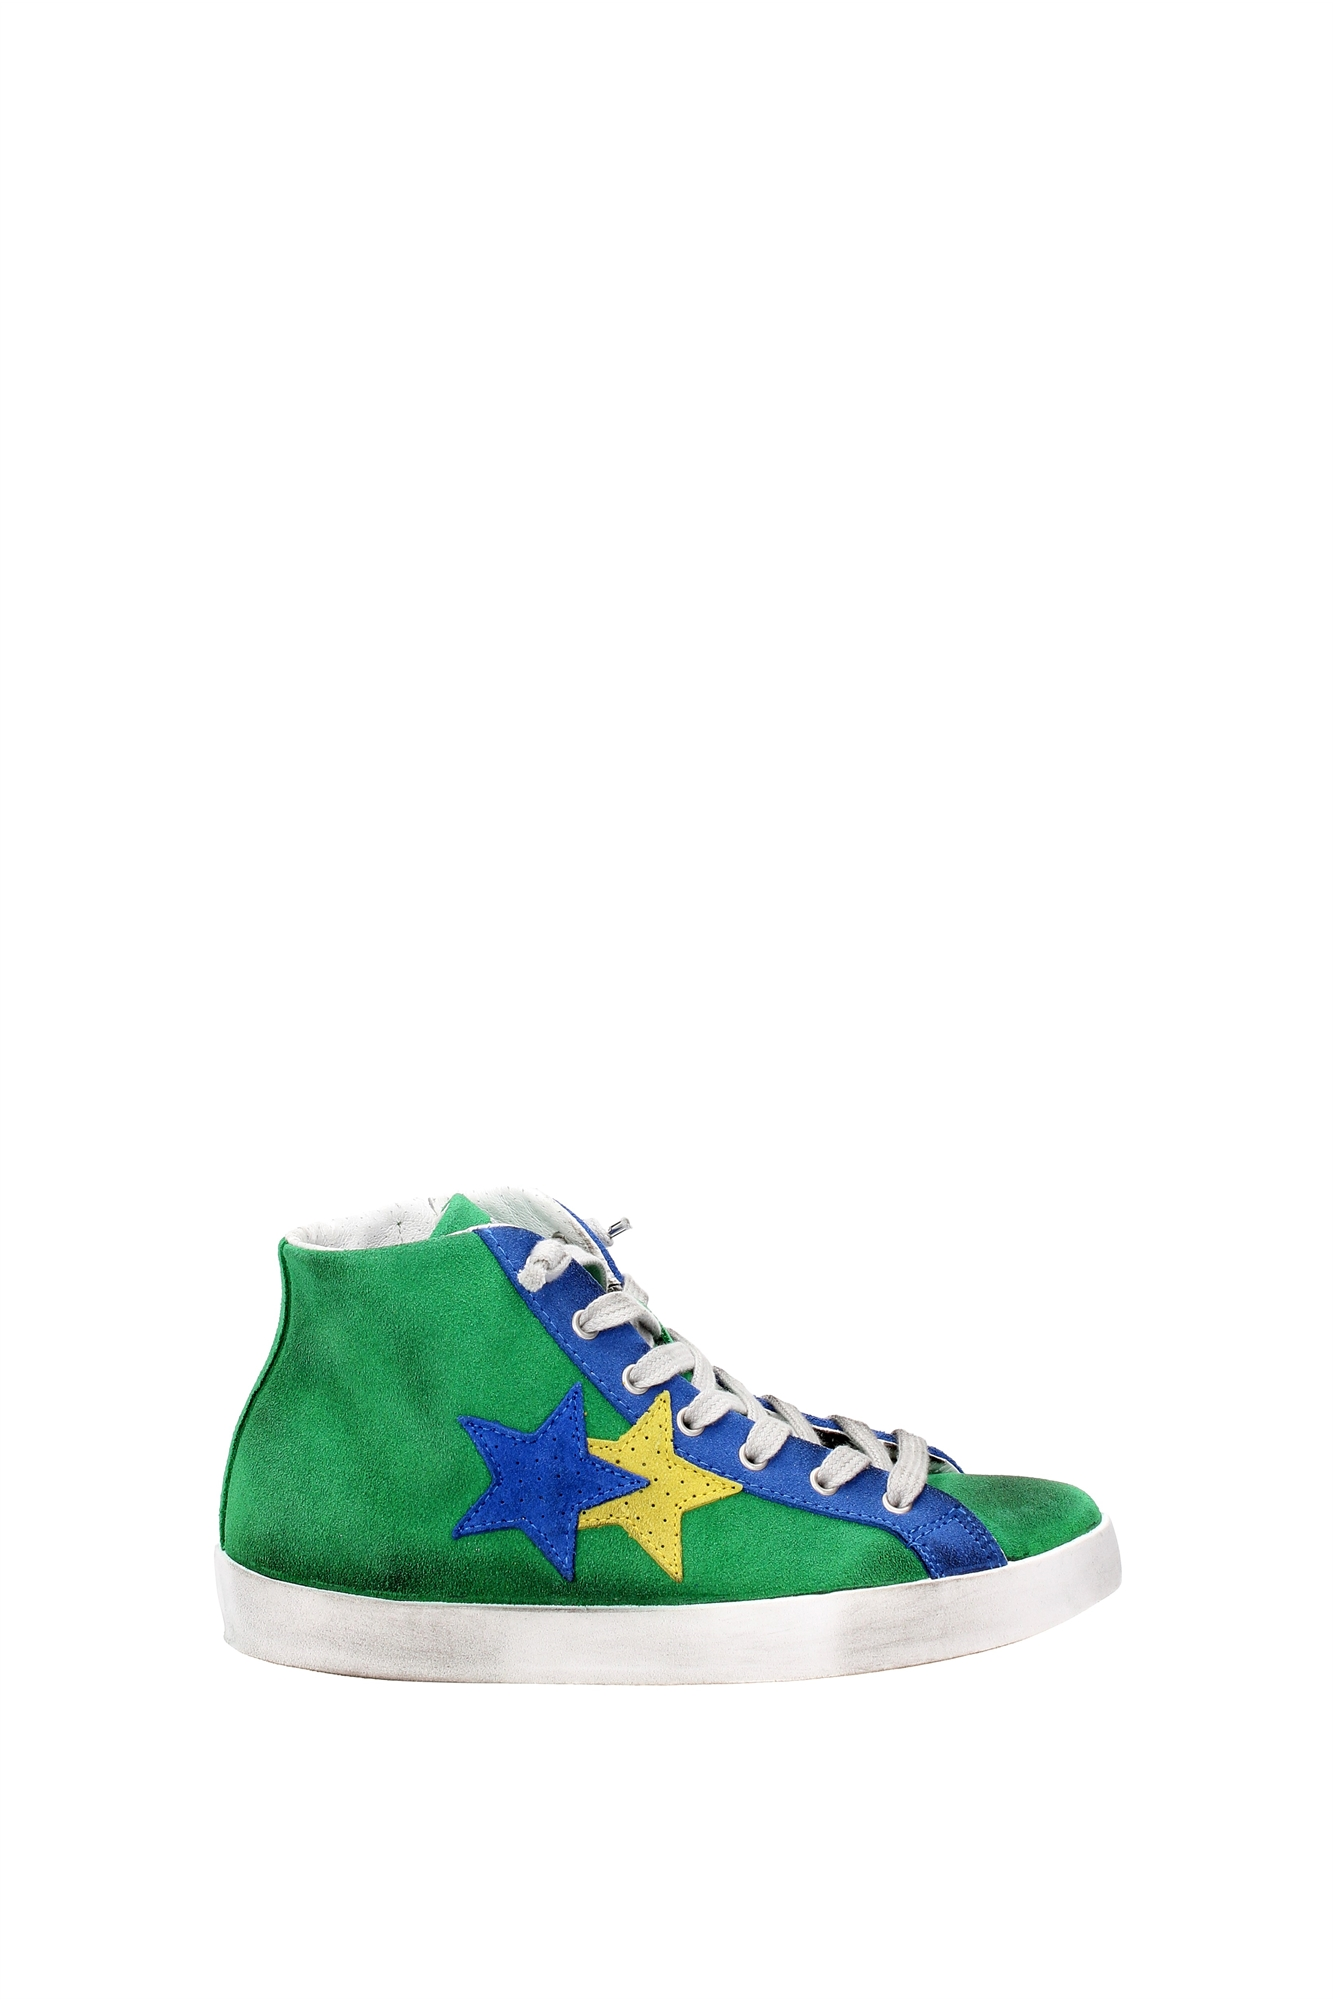 Sneakers 2star 2star Sneakers Damen - Wildleder (2SB626VERDEAZZURRO) bf45ff